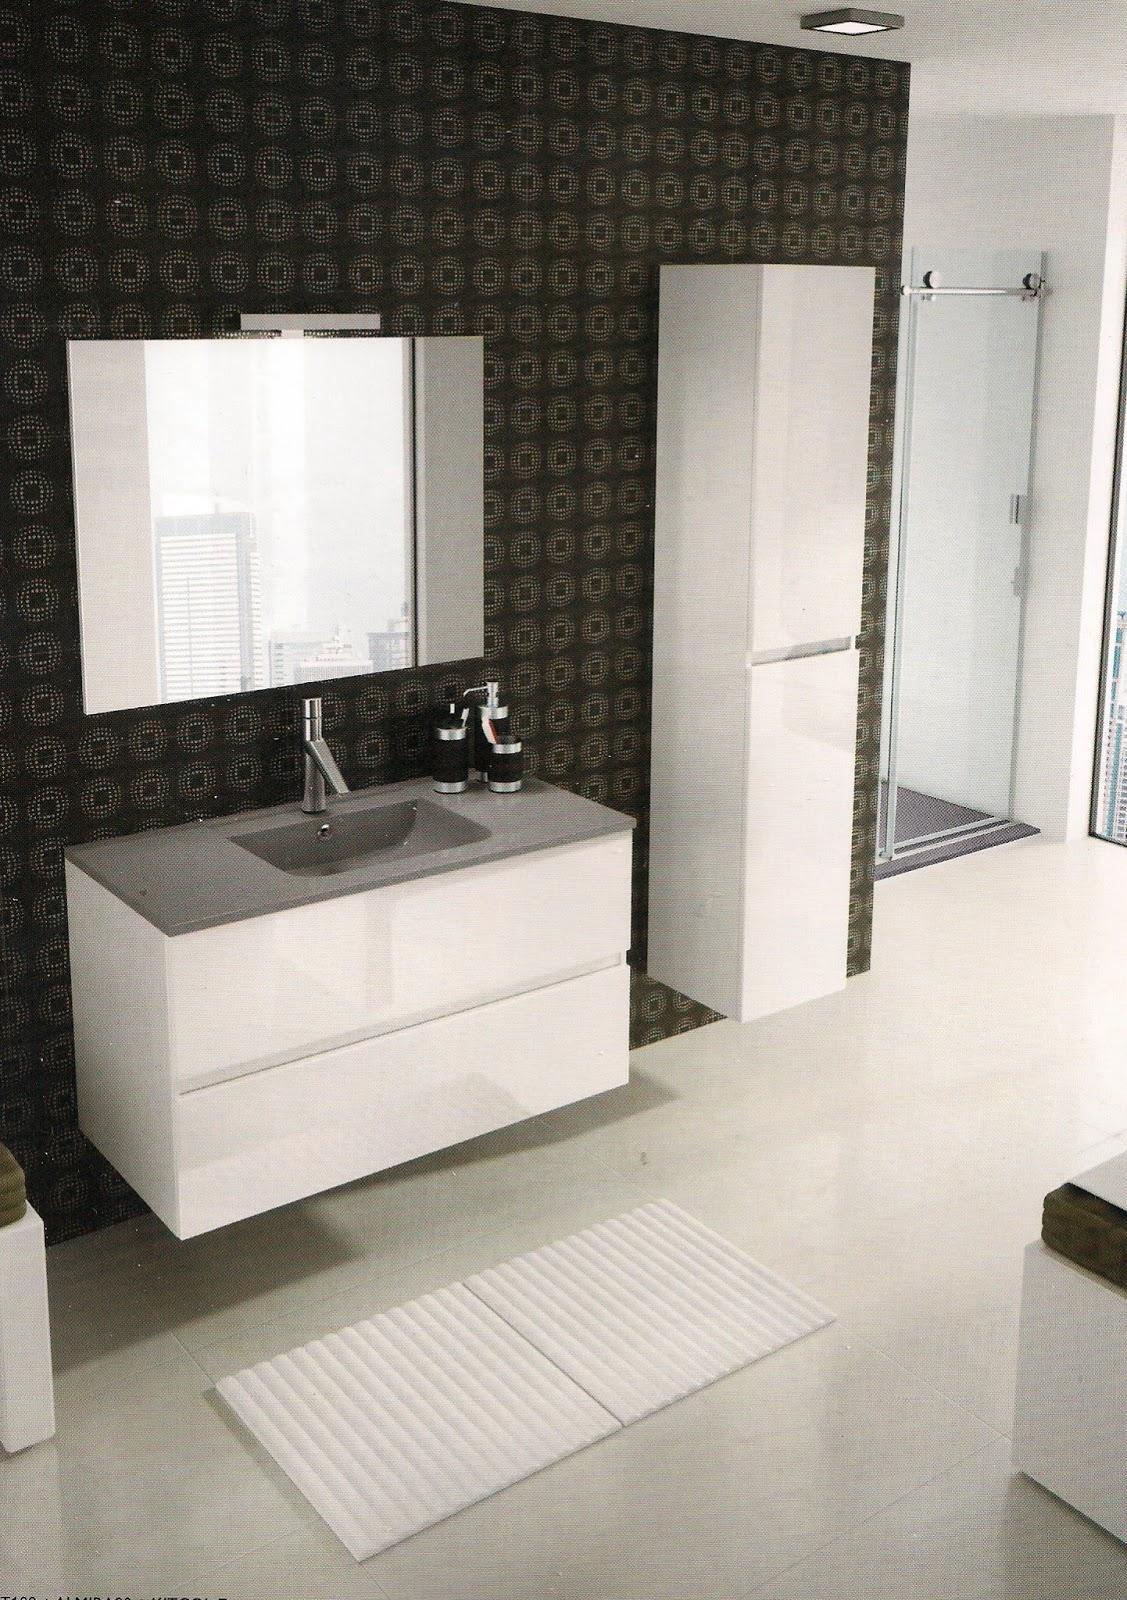 Aqualys burdin bossert prolians besancon meuble salle de bain ketty ambiance bain - Ambiance salle de bain carrelage ...